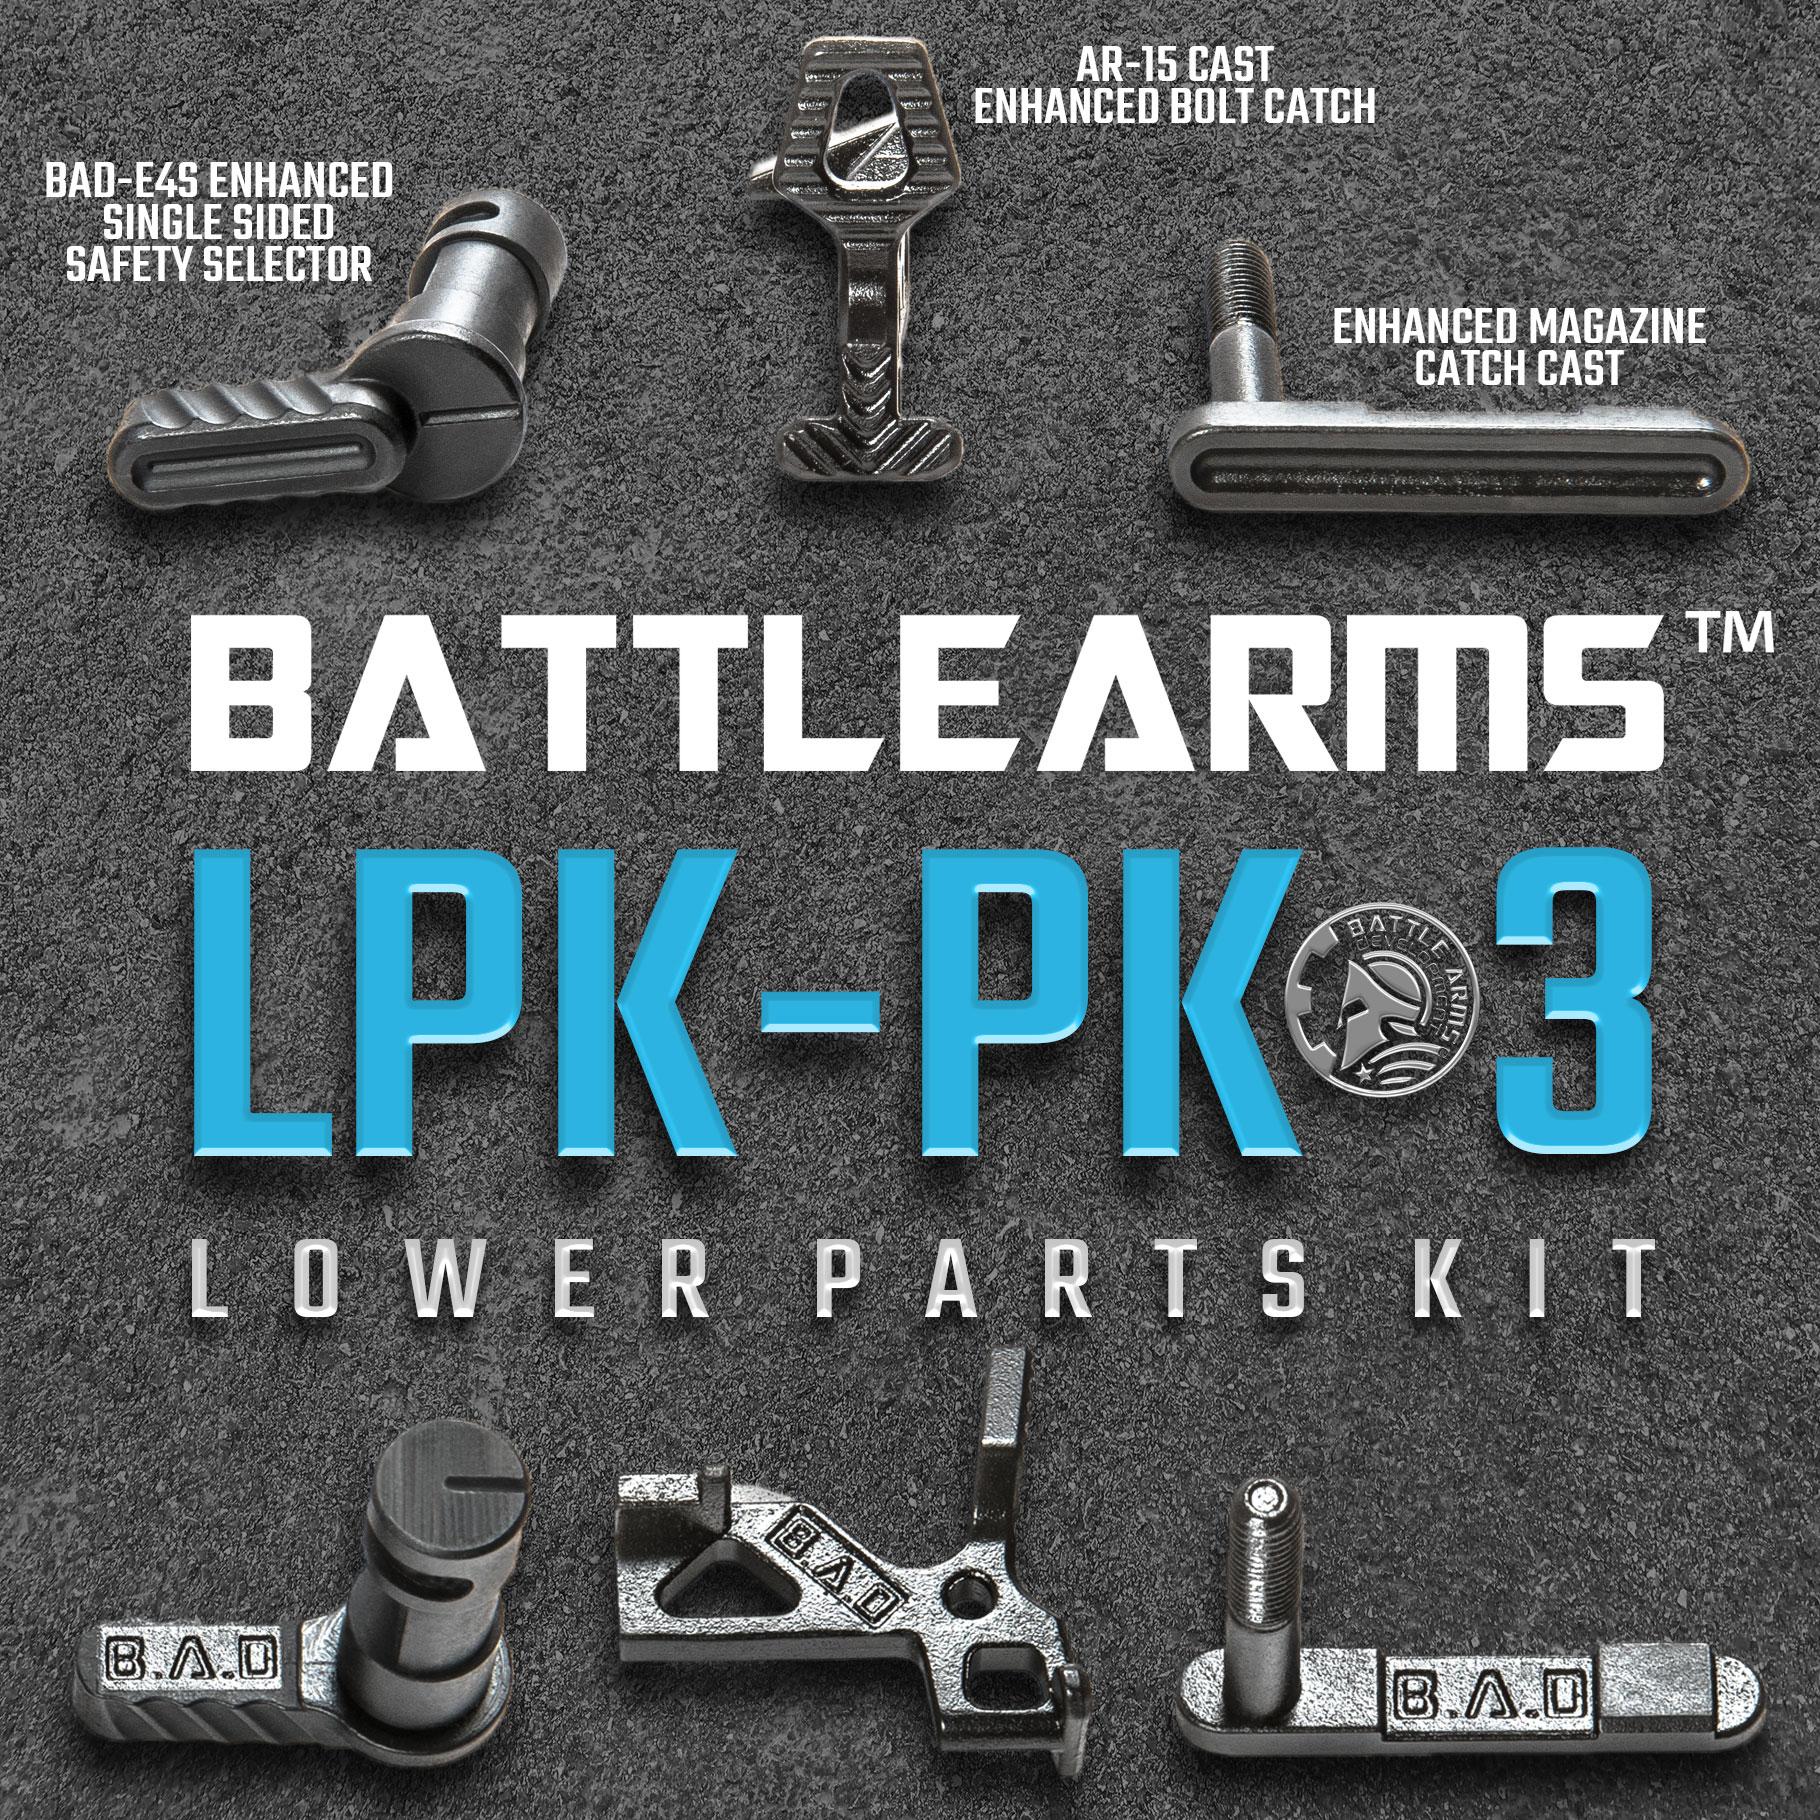 Battle Arms Development 3 Piece Enhanced Lower Parts Kit Package